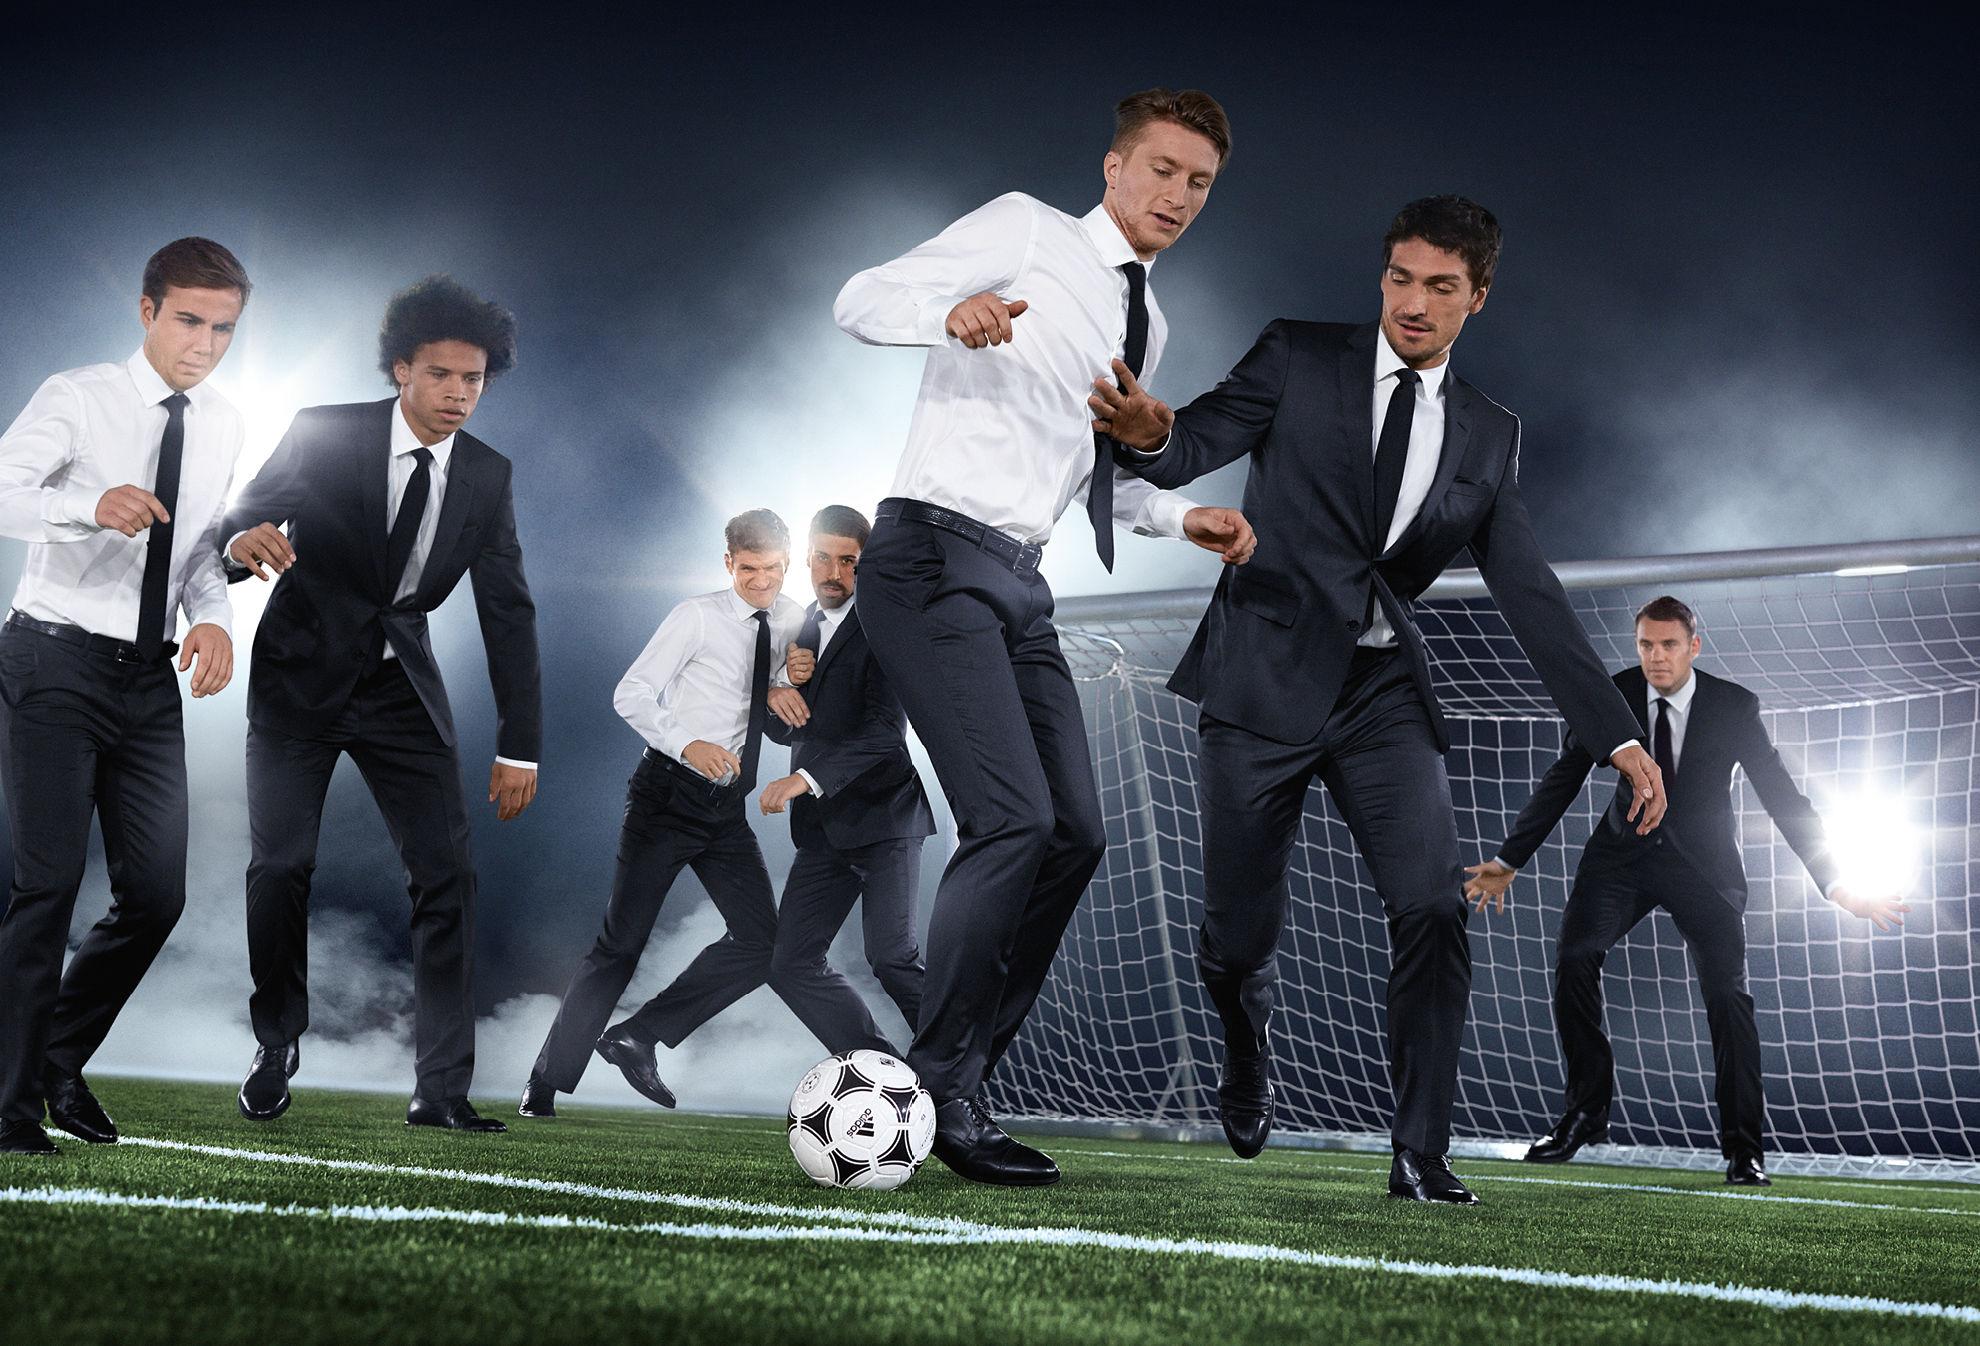 ассортимент картинки по футболу костюмы также